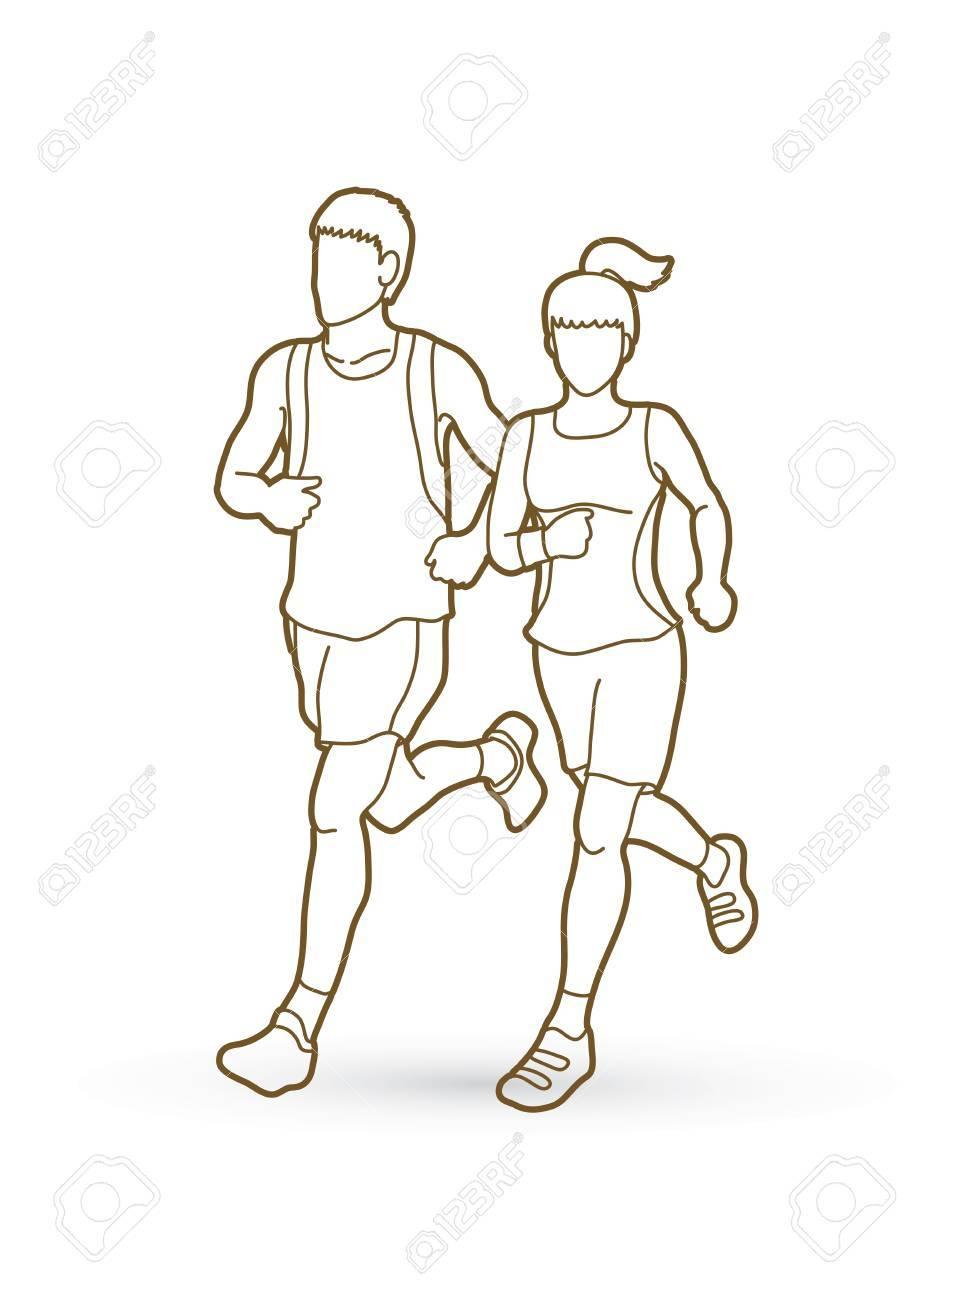 975x1300 Man And Woman Running Together, Marathon Runner Outline Stroke